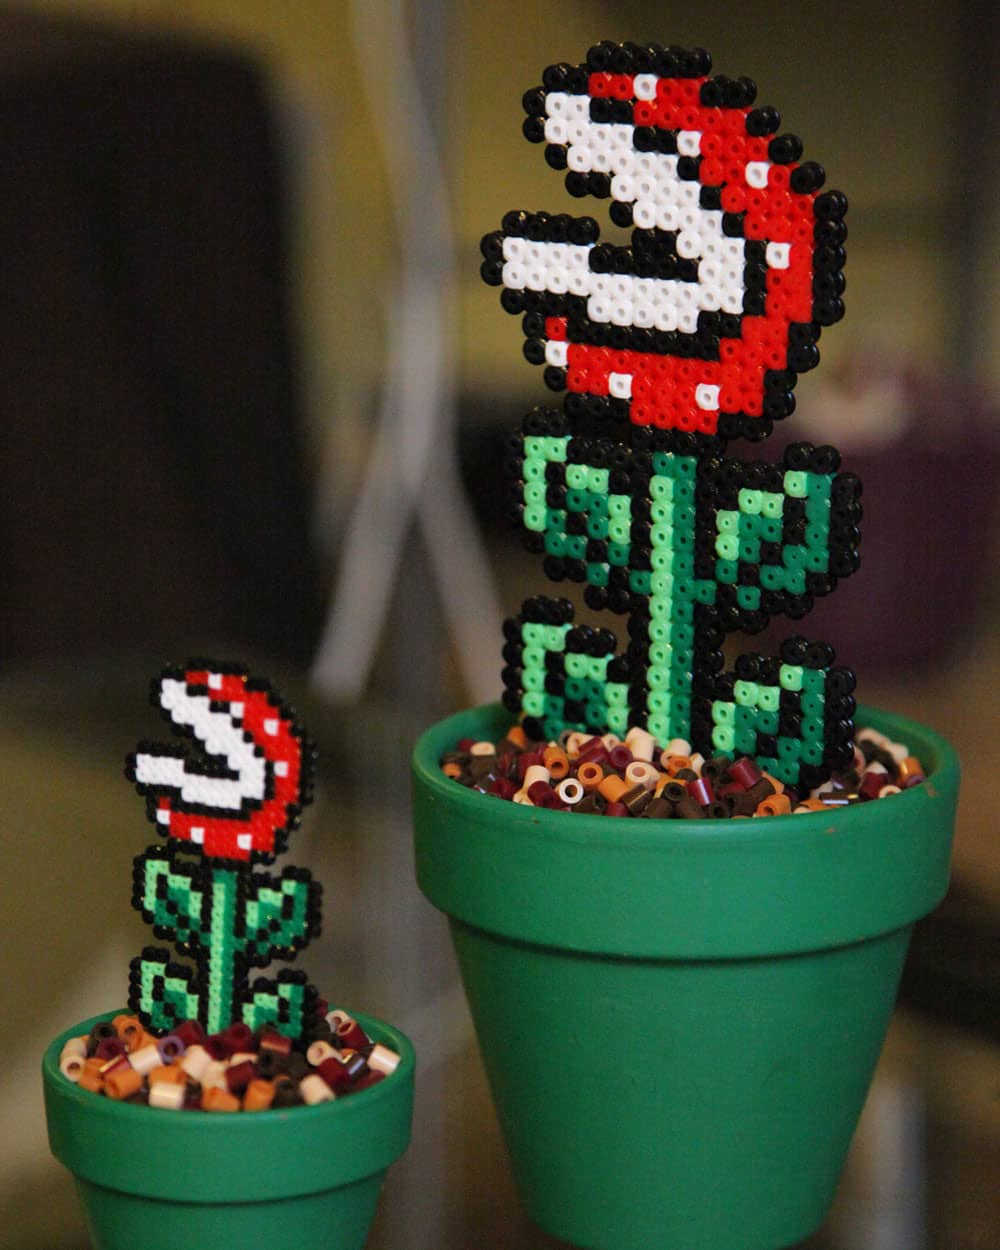 Bead x Bead Super Mario Potted Piranha Plant Buy for Geek Boyfriend